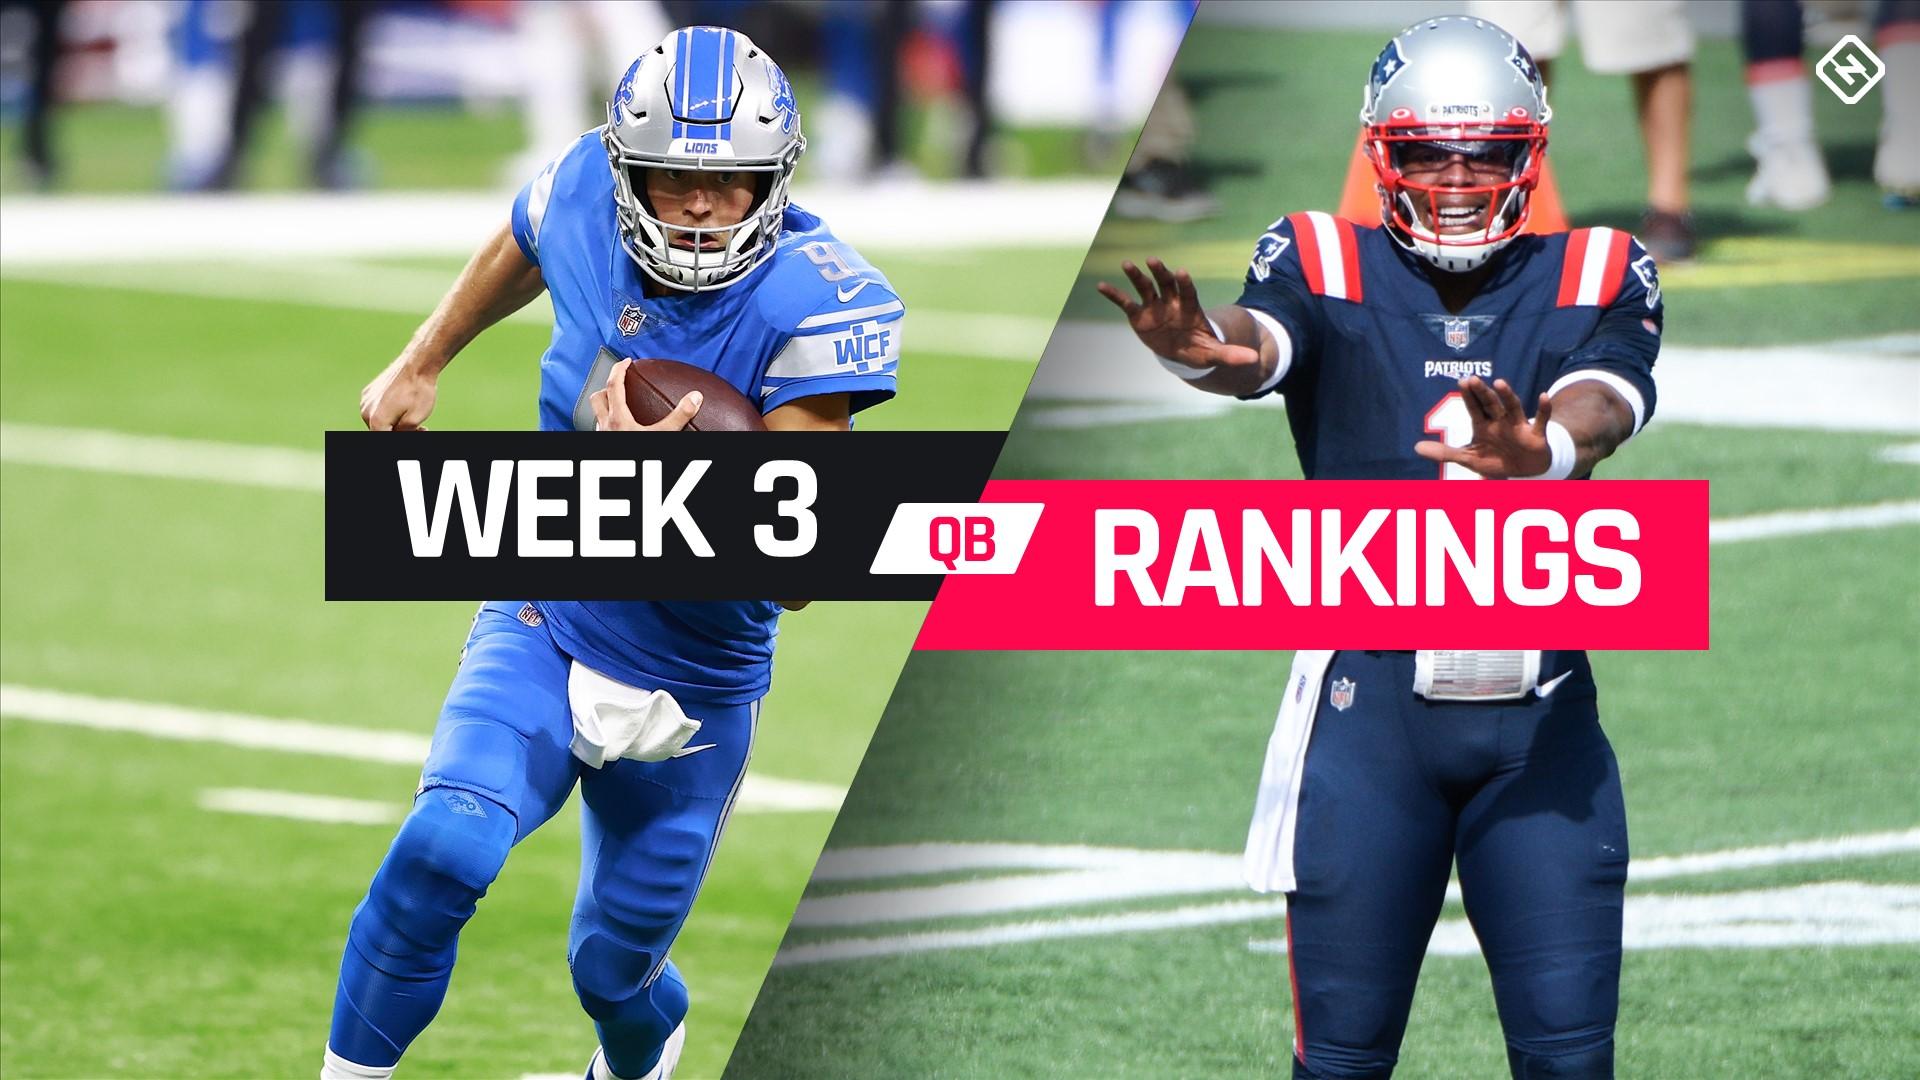 Week 3 Fantasy QB Rankings: Must-starts, sleepers, potential busts at quarterback